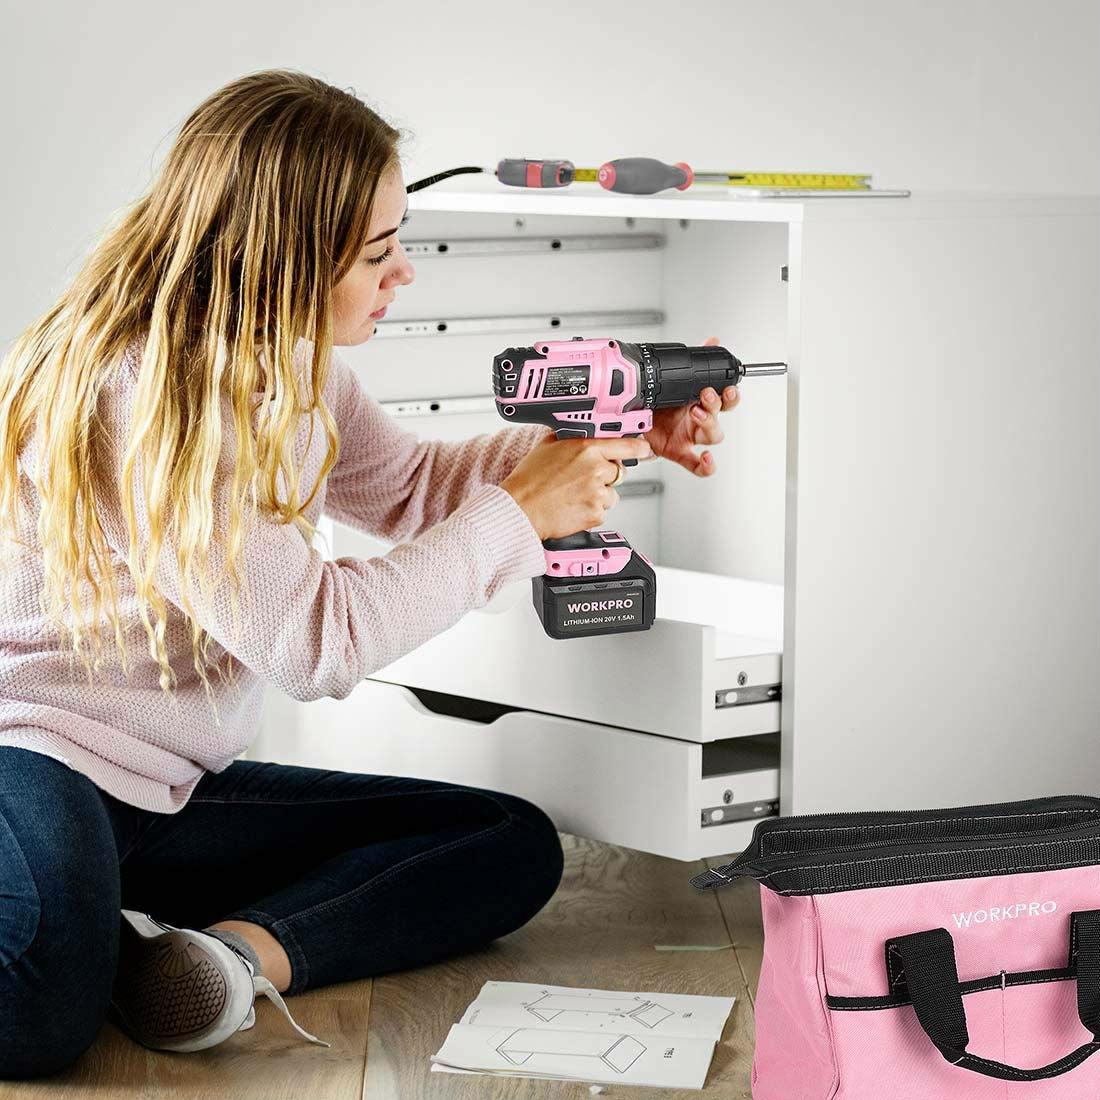 Best Bubblegum Pink Cordless Drill: WORKPRO 20V Cordless Drill